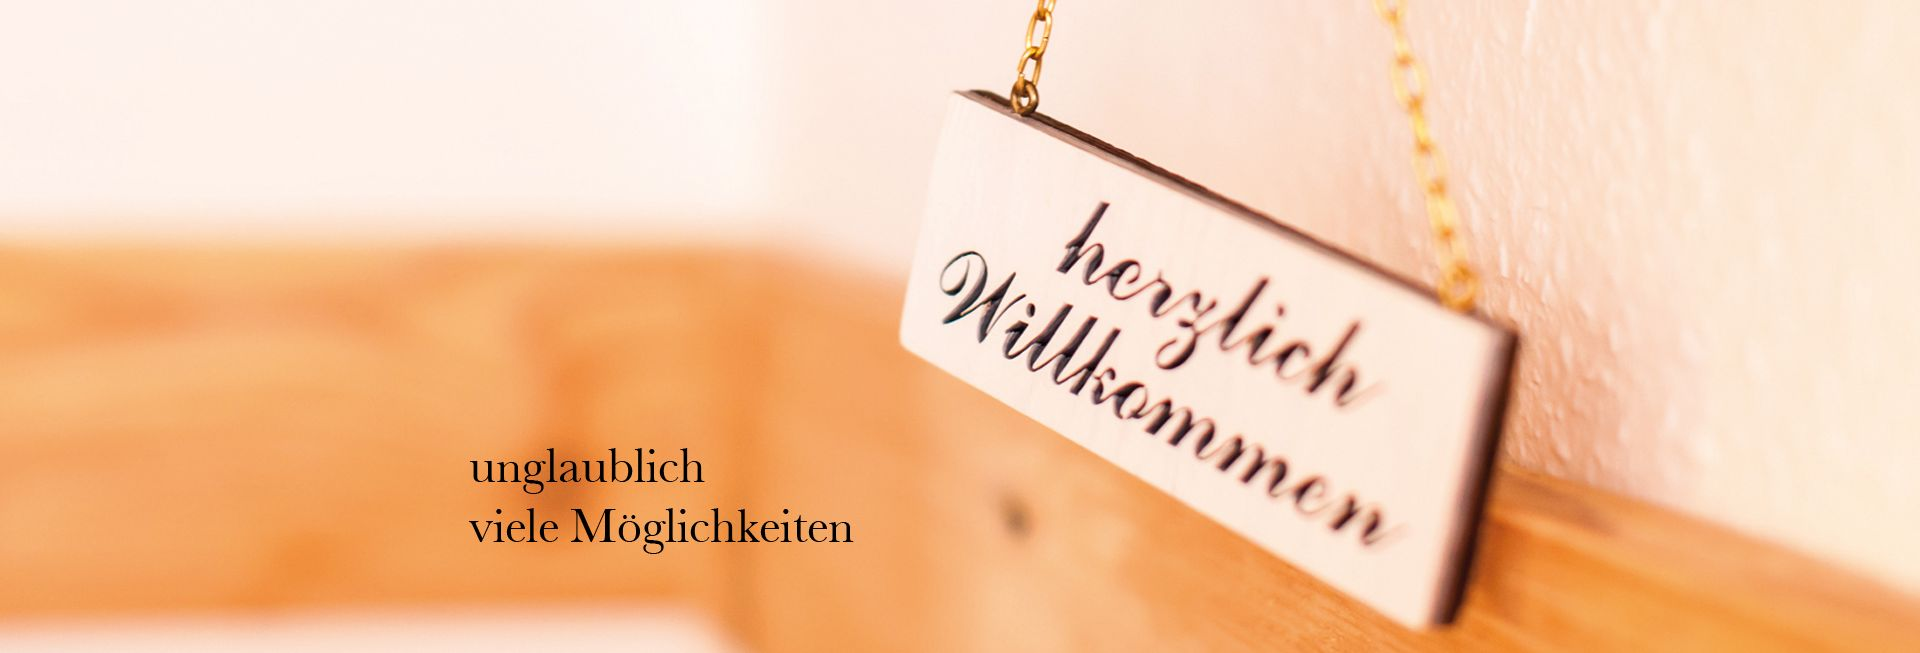 Kolmenhof Web Header Startseite